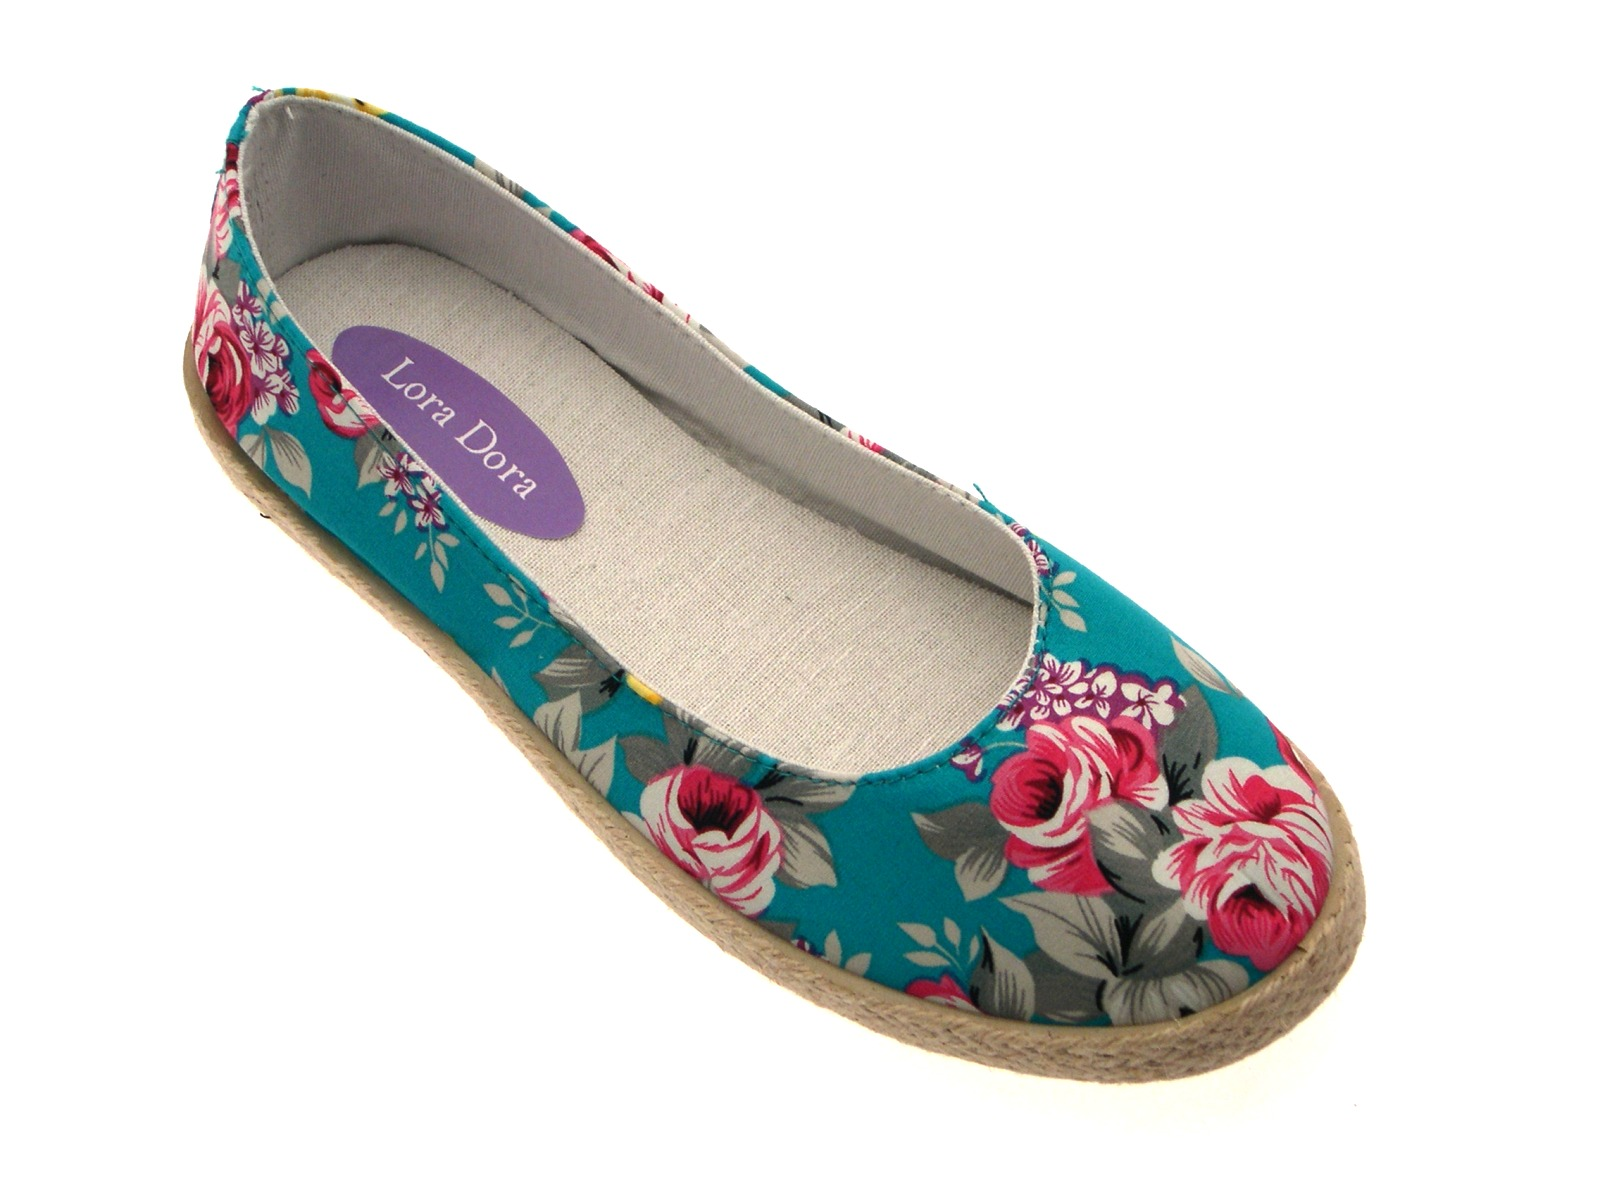 30a5a48197b2 Womens Floral Flat Canvas Pumps Hessian Espadrilles Plimsolls Shoes ...